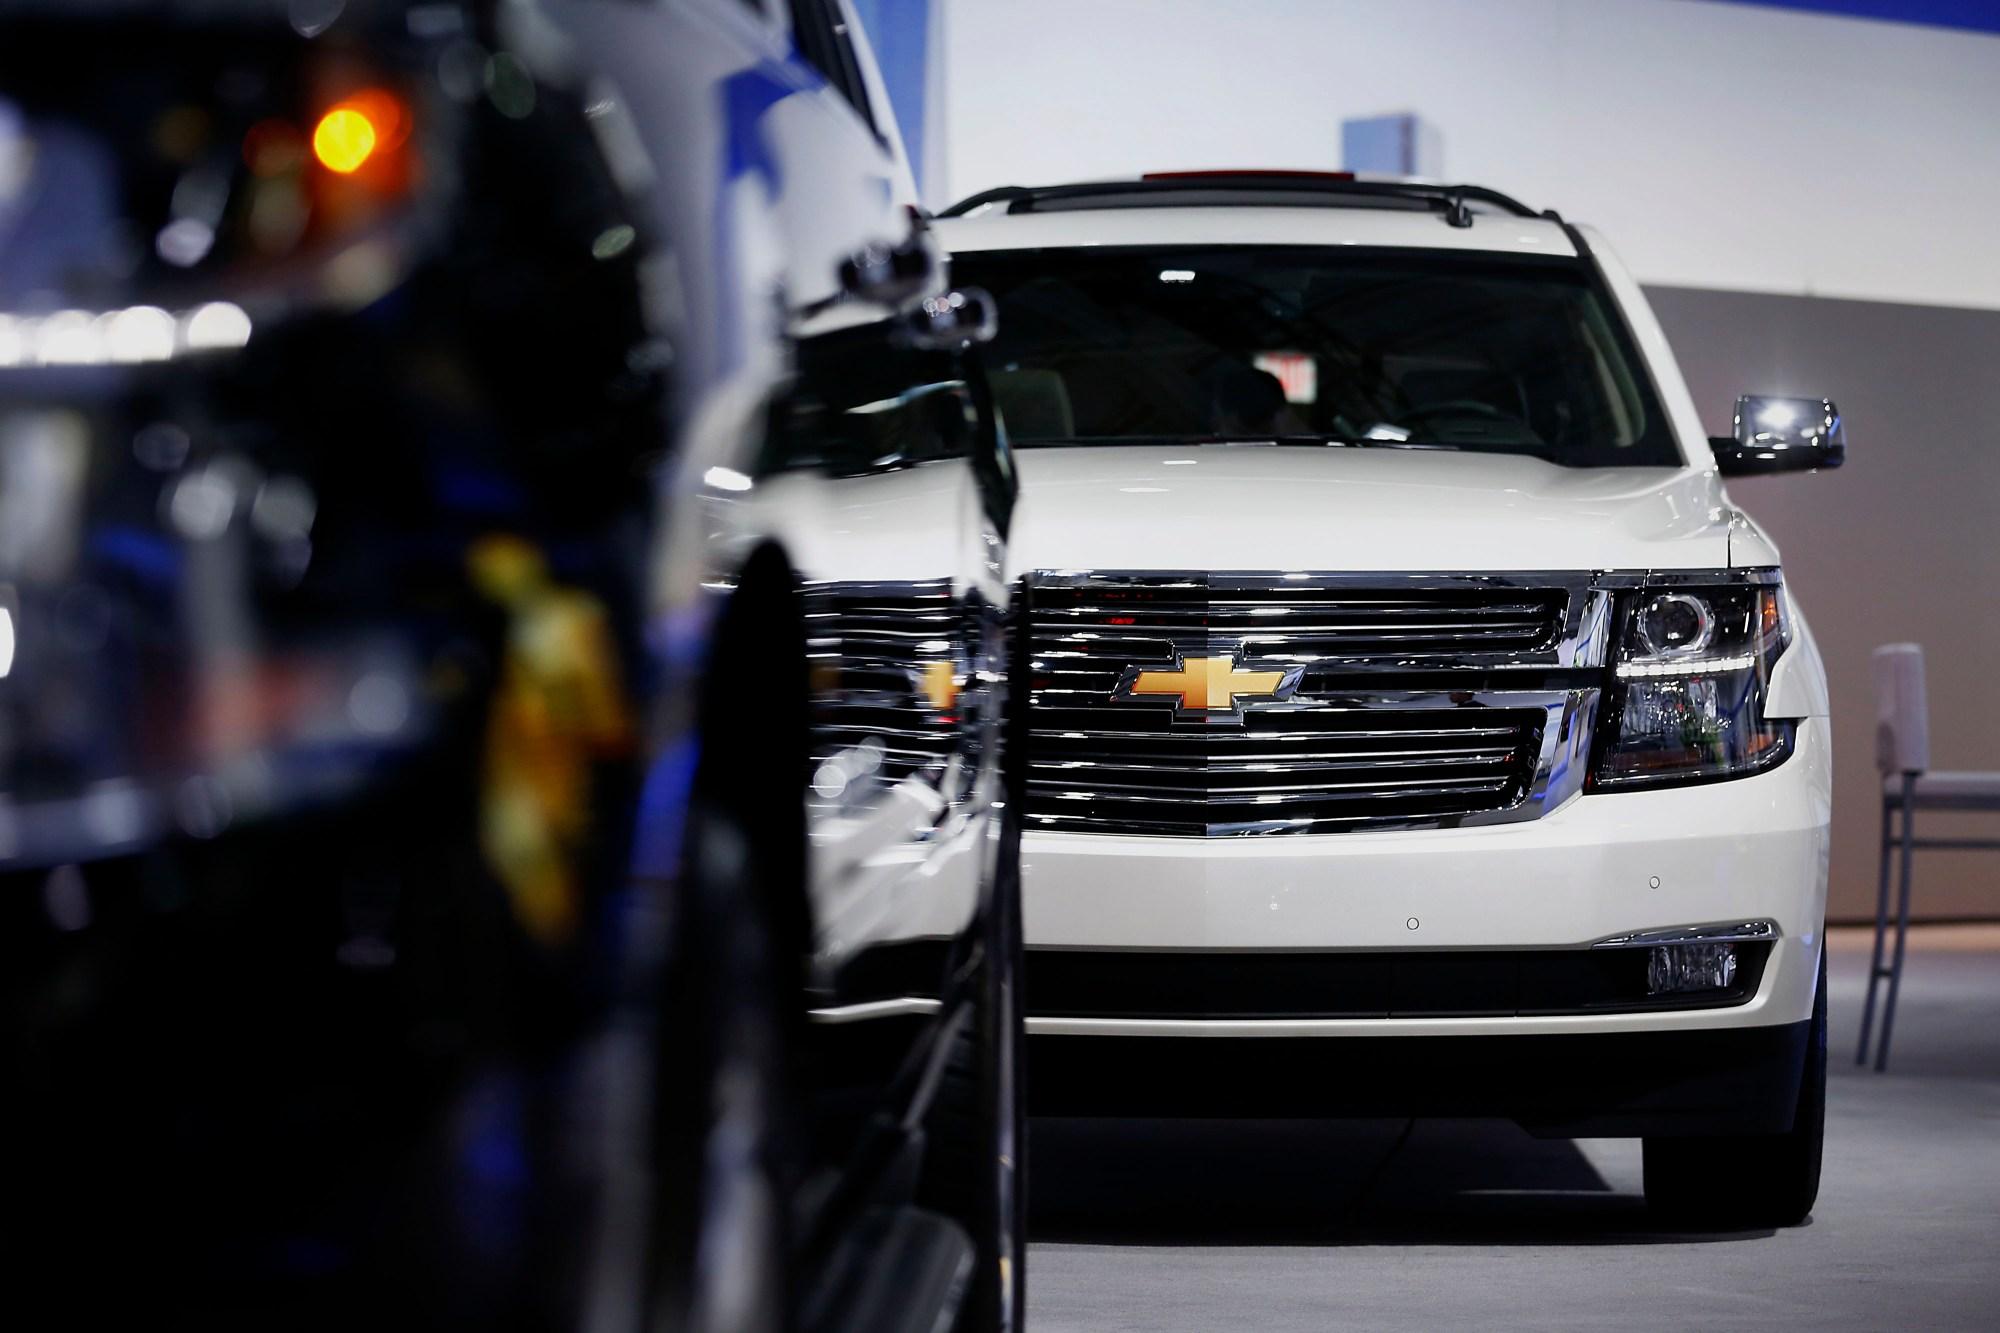 hight resolution of  inside the 2014 new york international auto show